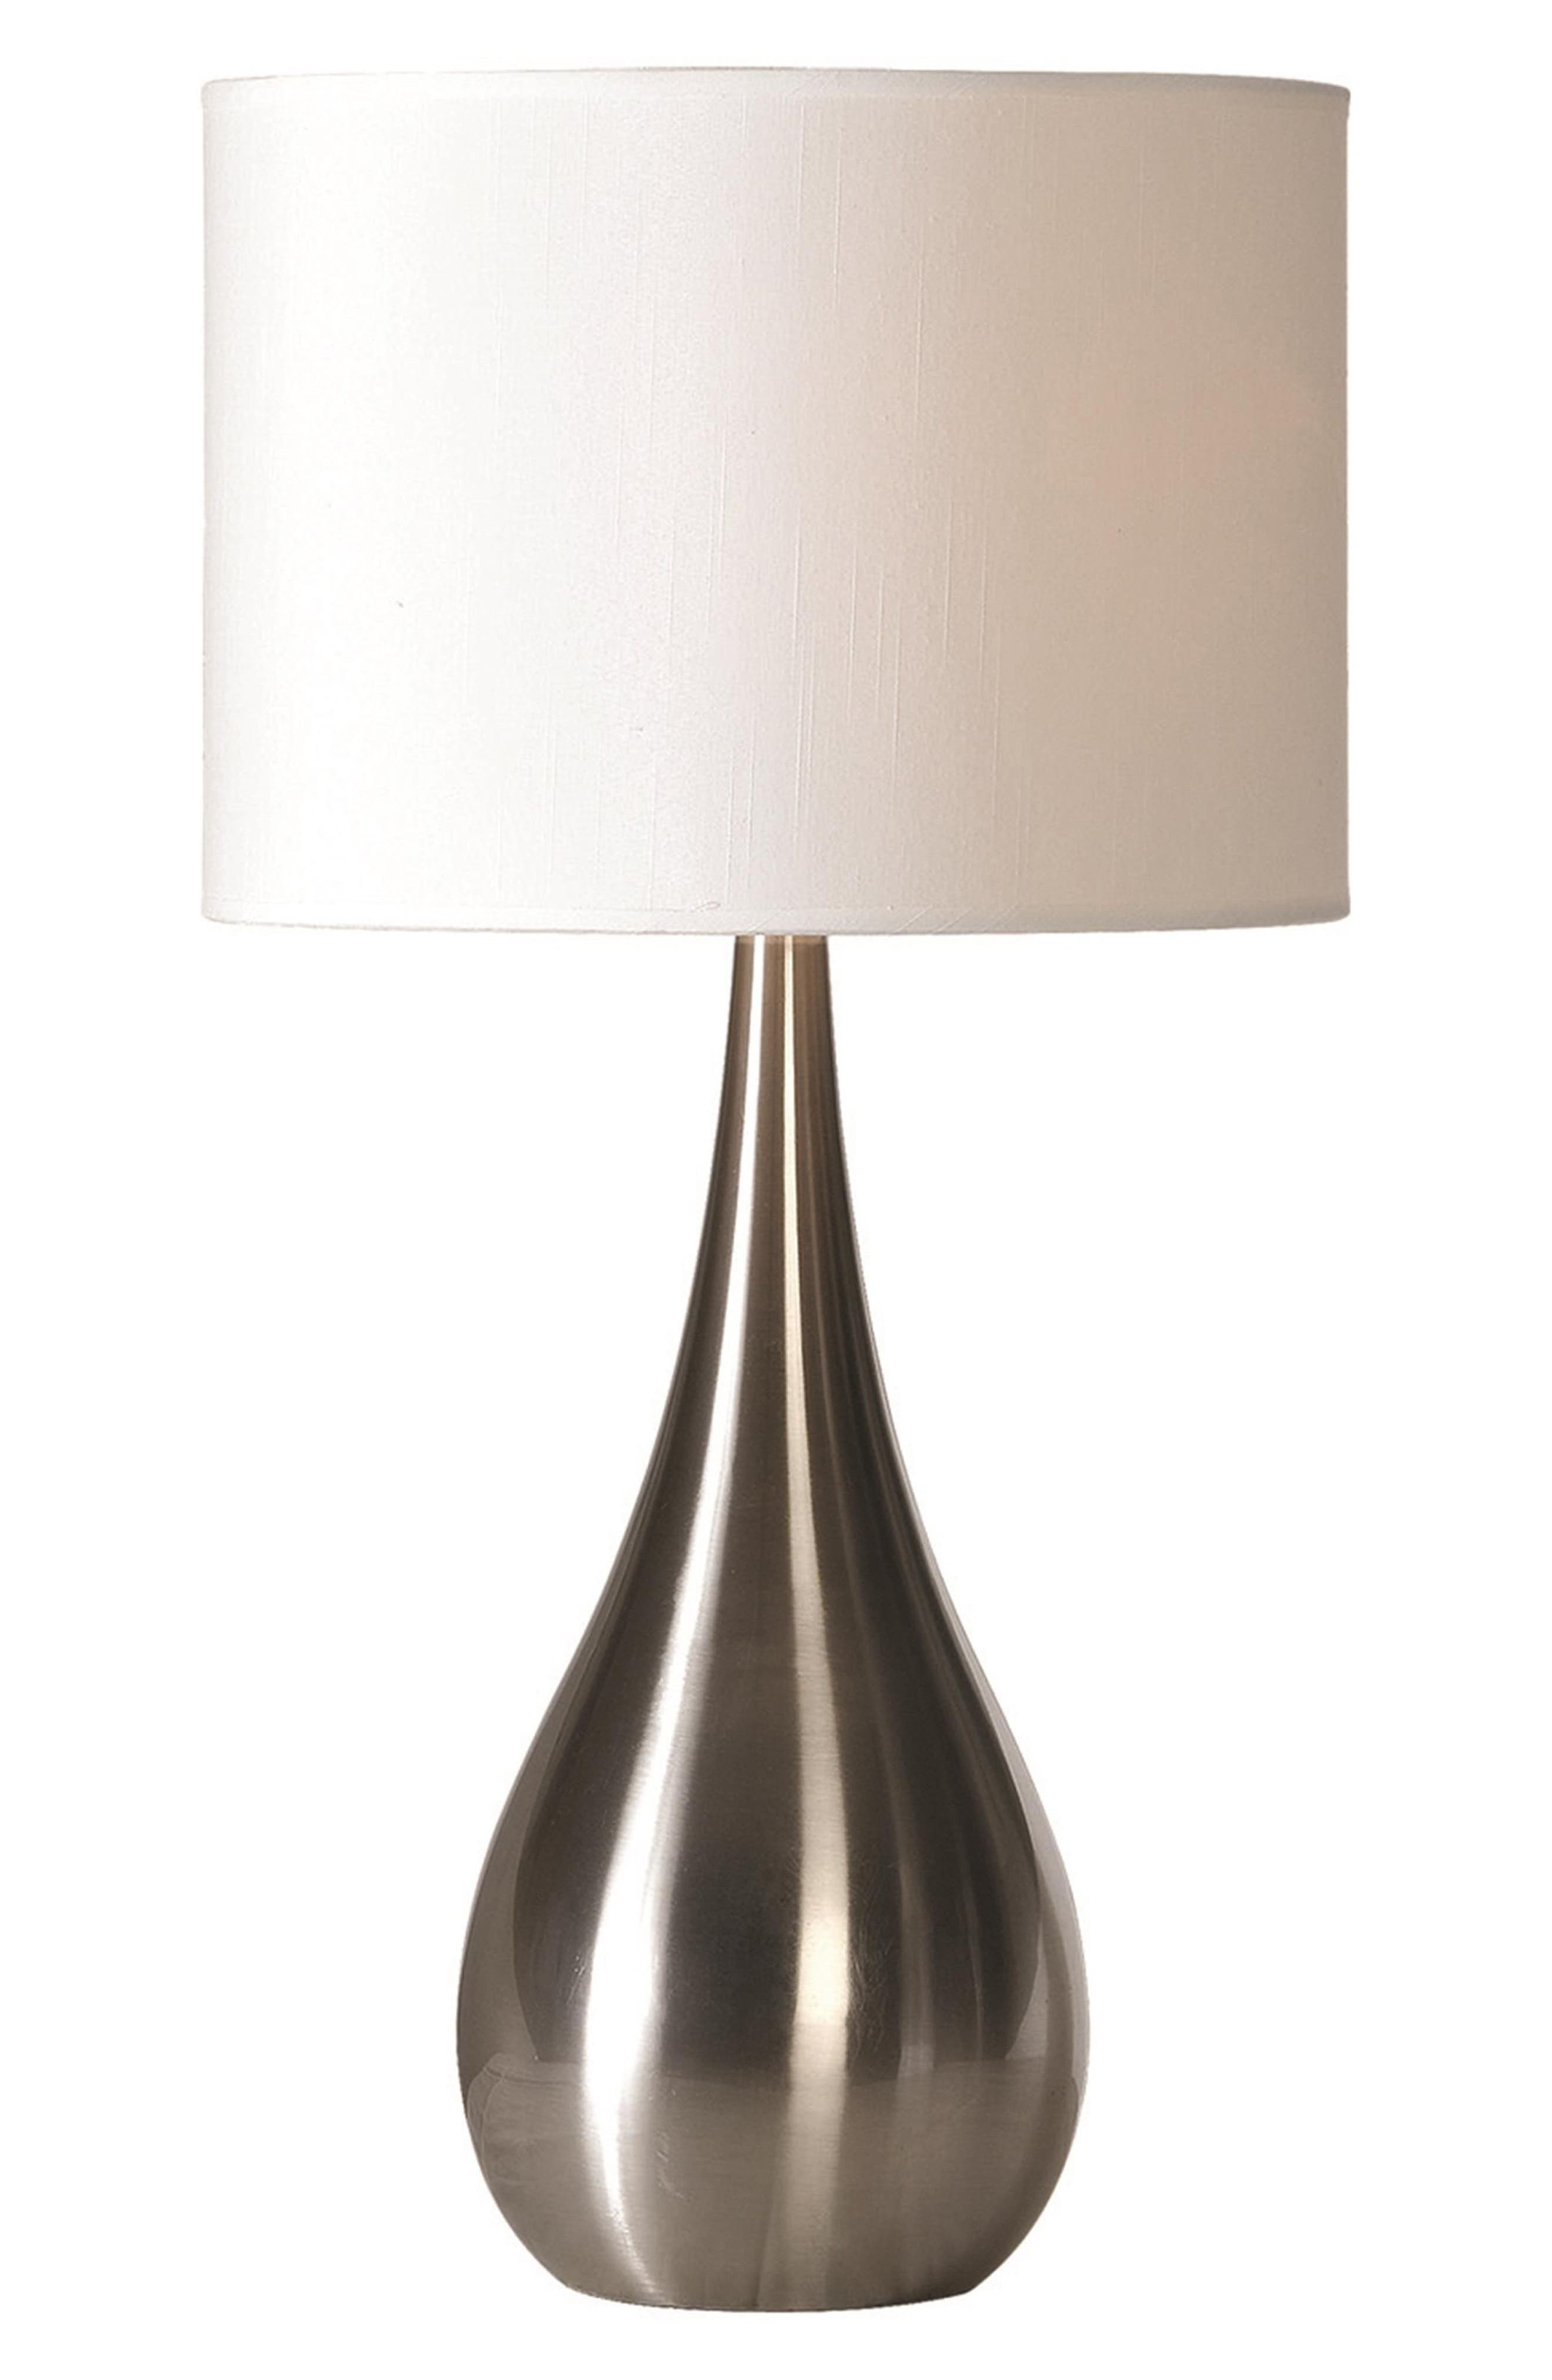 Alba Table Lamp,                             Main thumbnail 1, color,                             040